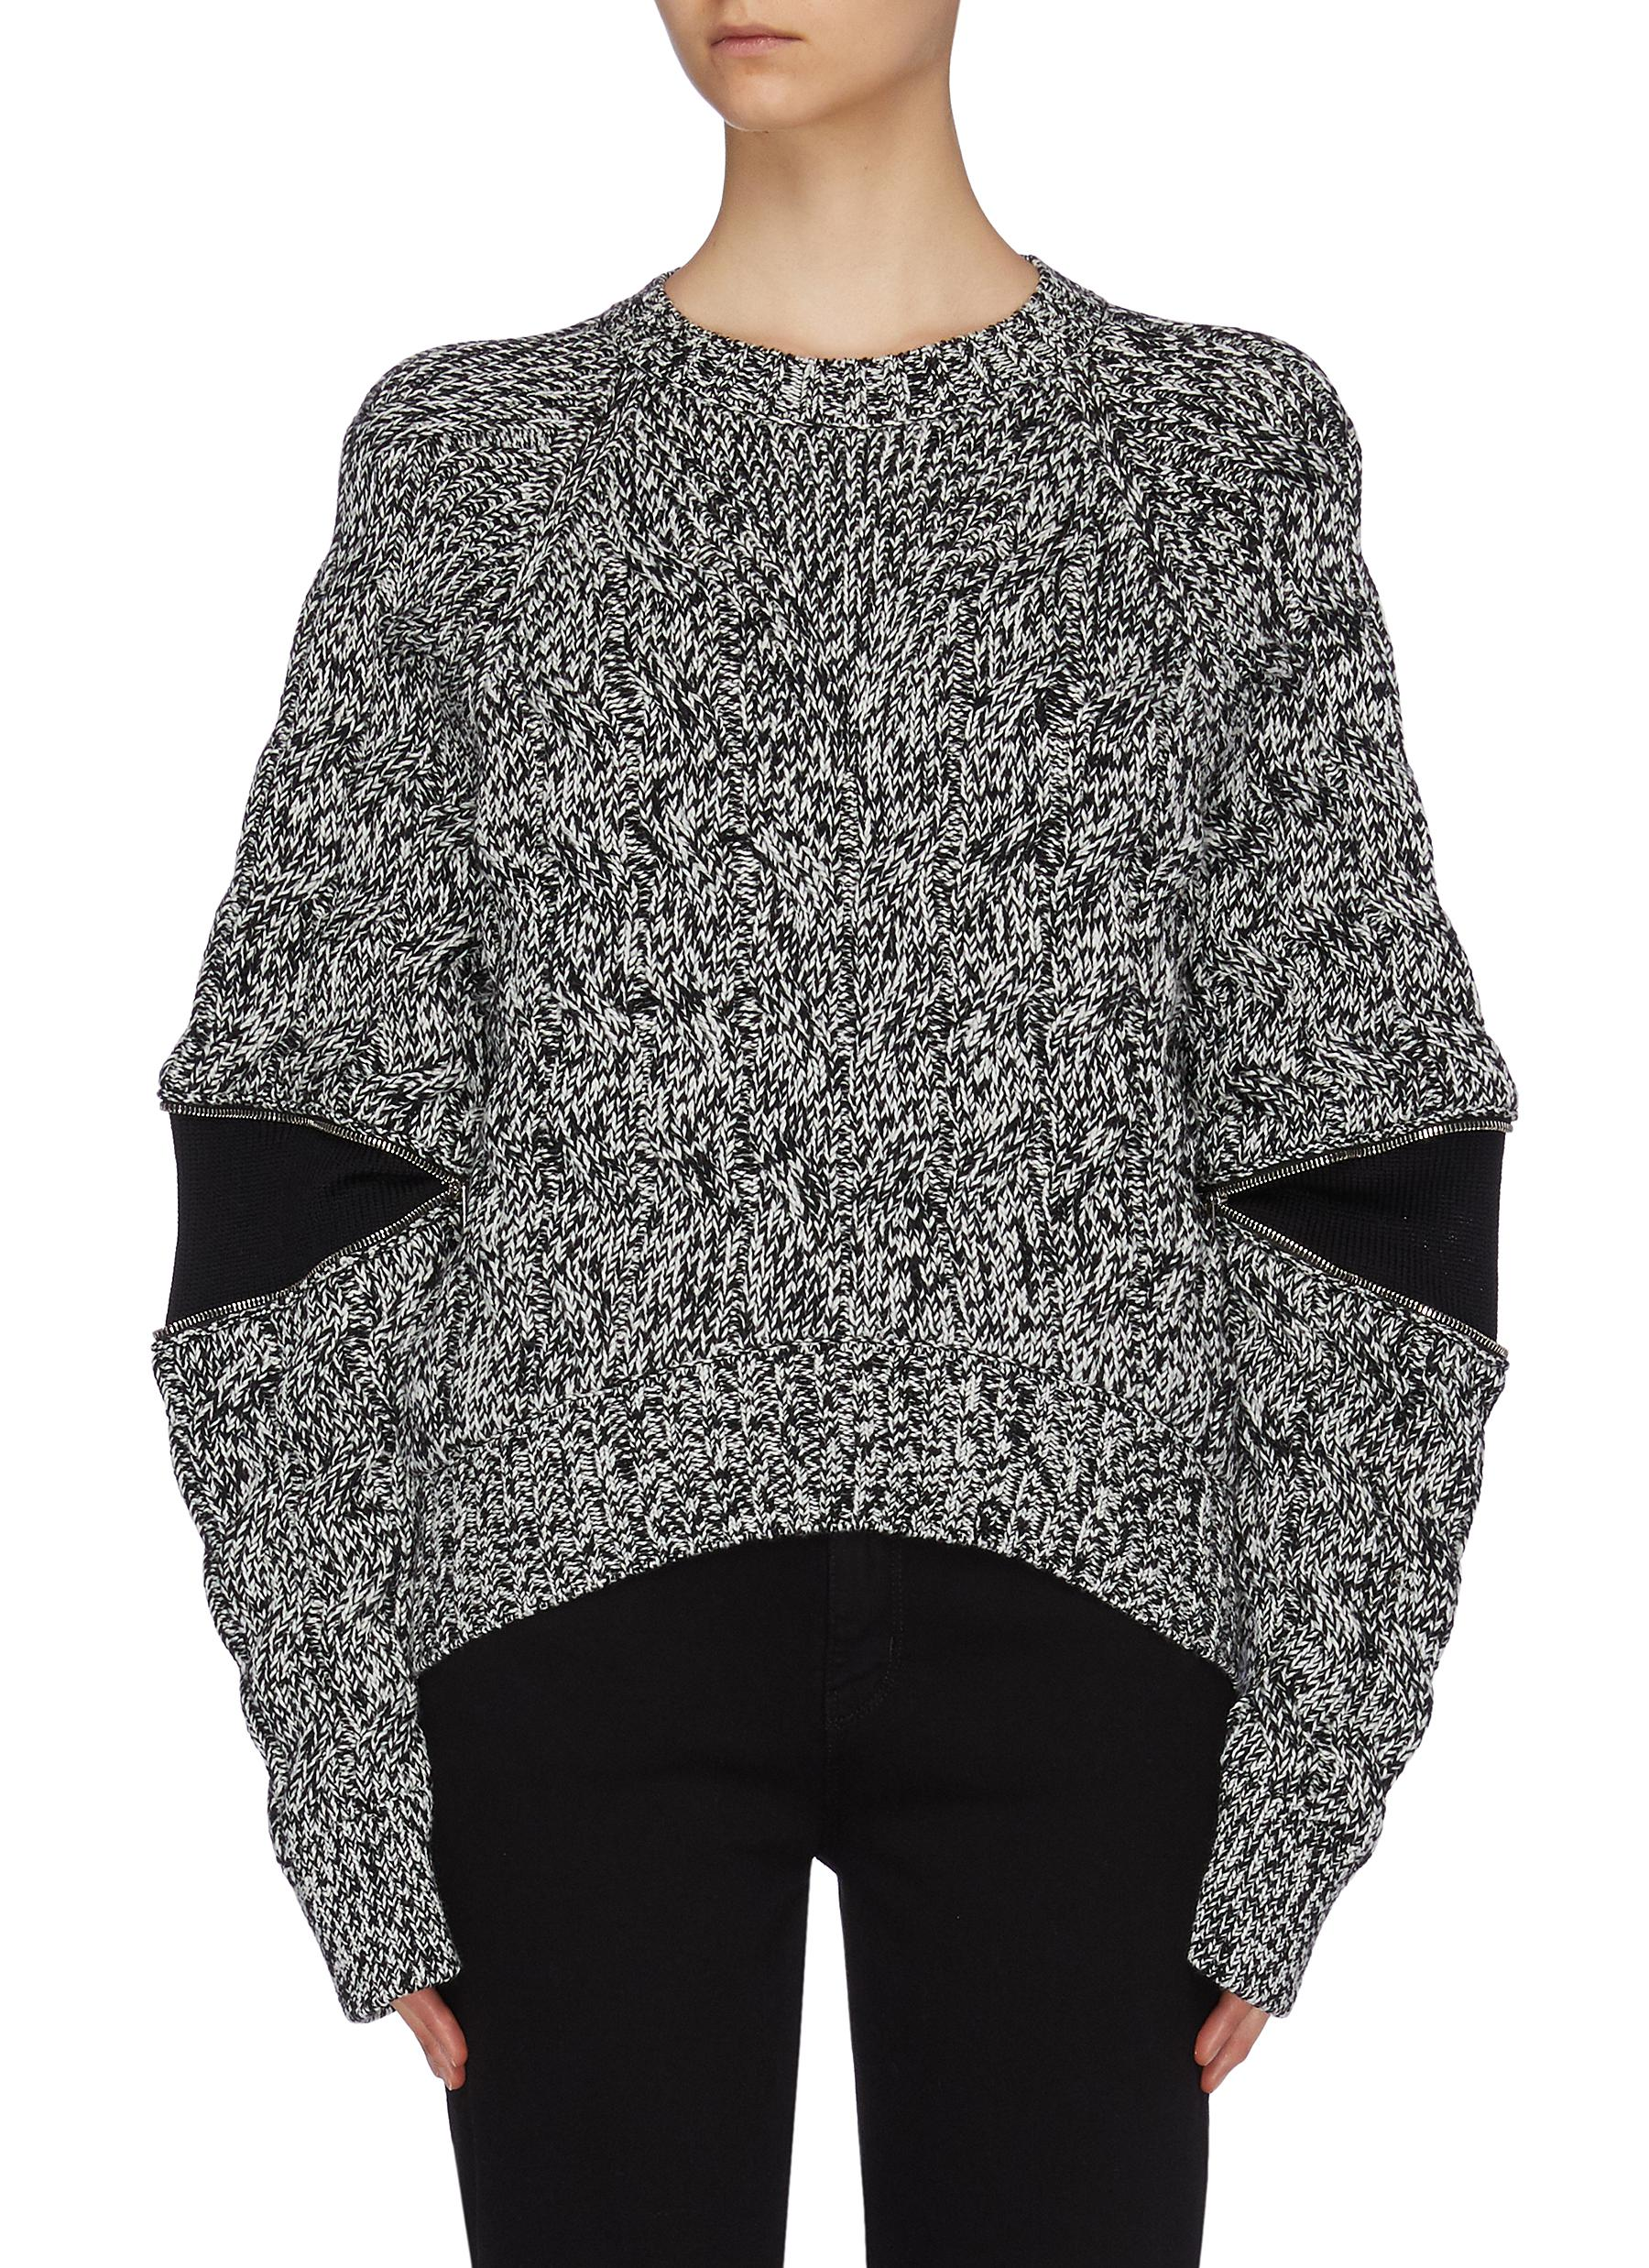 Zip elbow panel marled wool sweater by Alexander Mcqueen